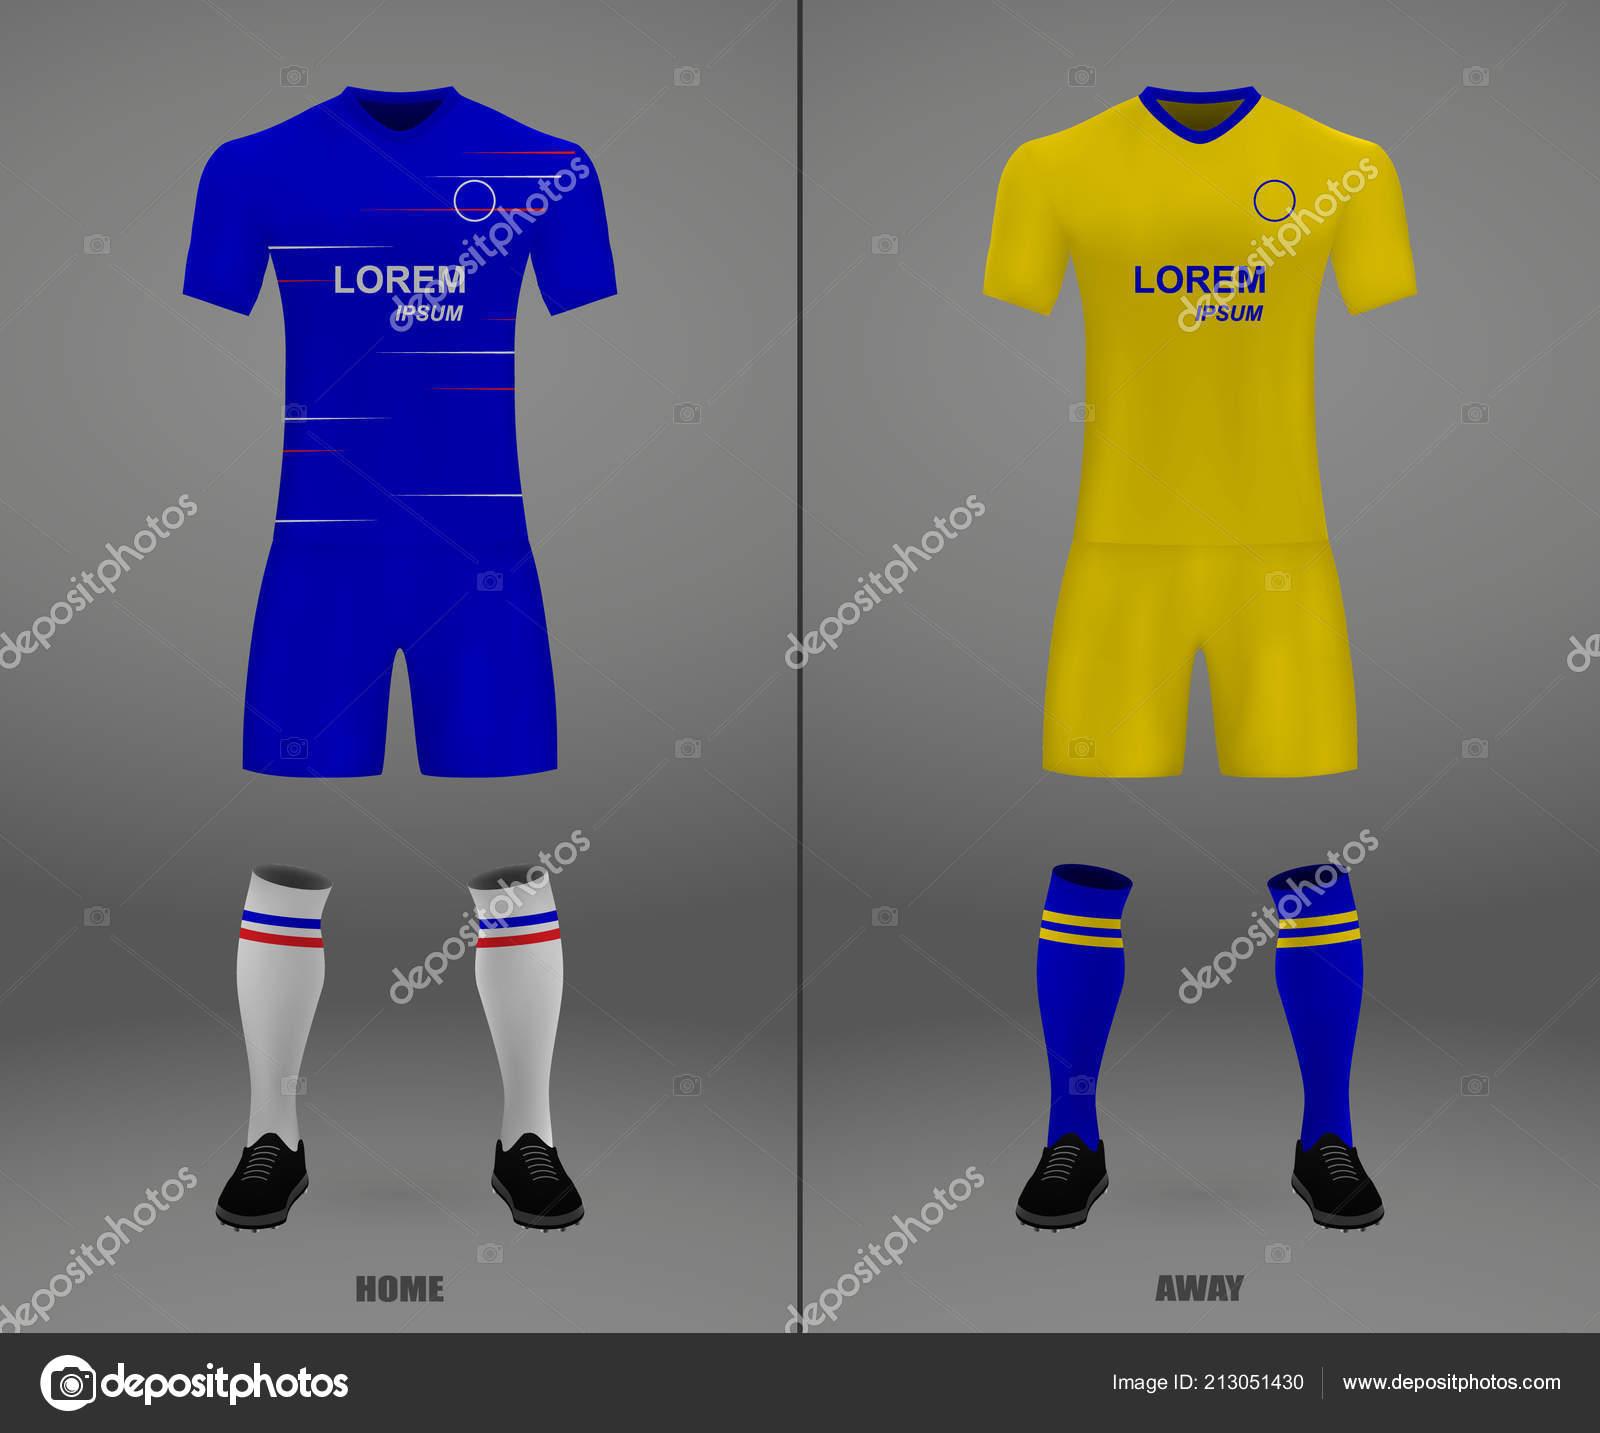 Kit Fútbol Chelsea 2018 Plantilla Camiseta Para Fútbol Ilustración Vector —  Vector de stock fe34d466d2536